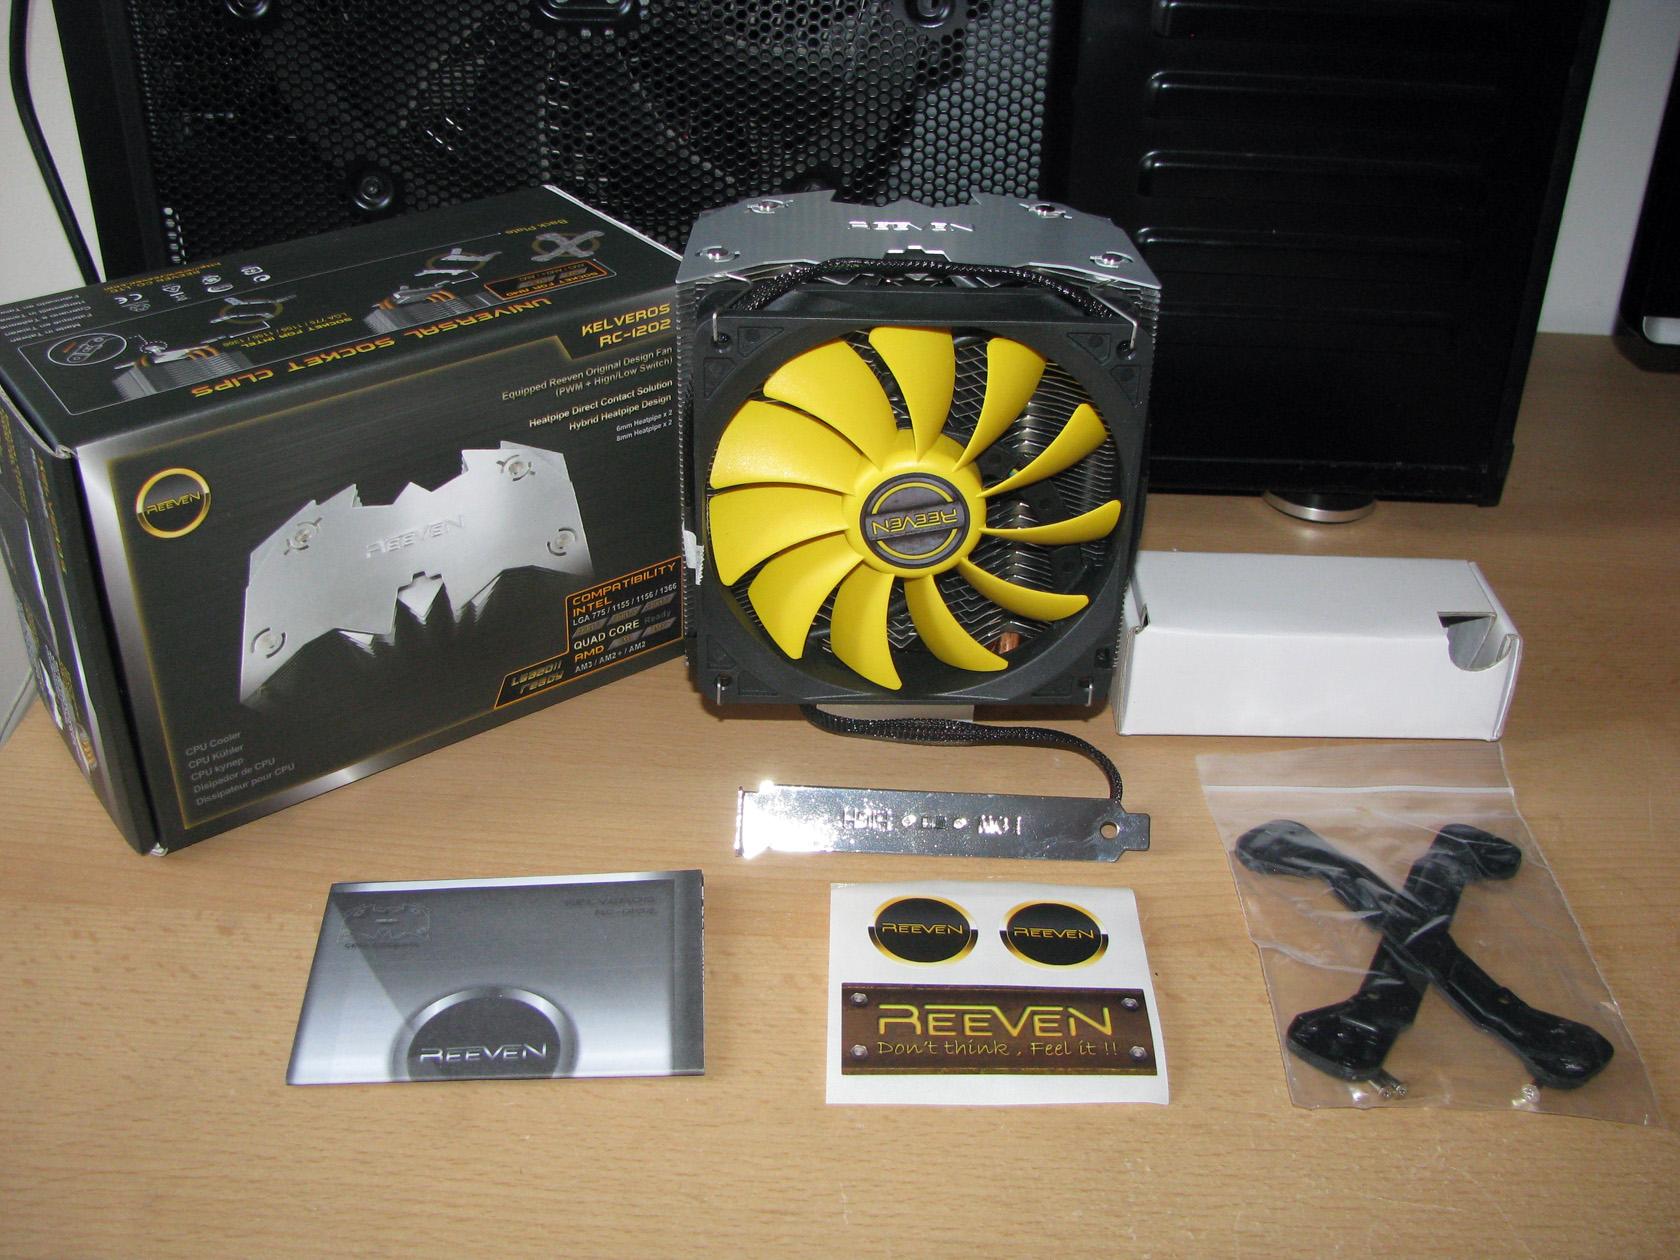 Reeven Kelveros Rc1202 Test And Review Fan Processor Lga 775 Original Inside